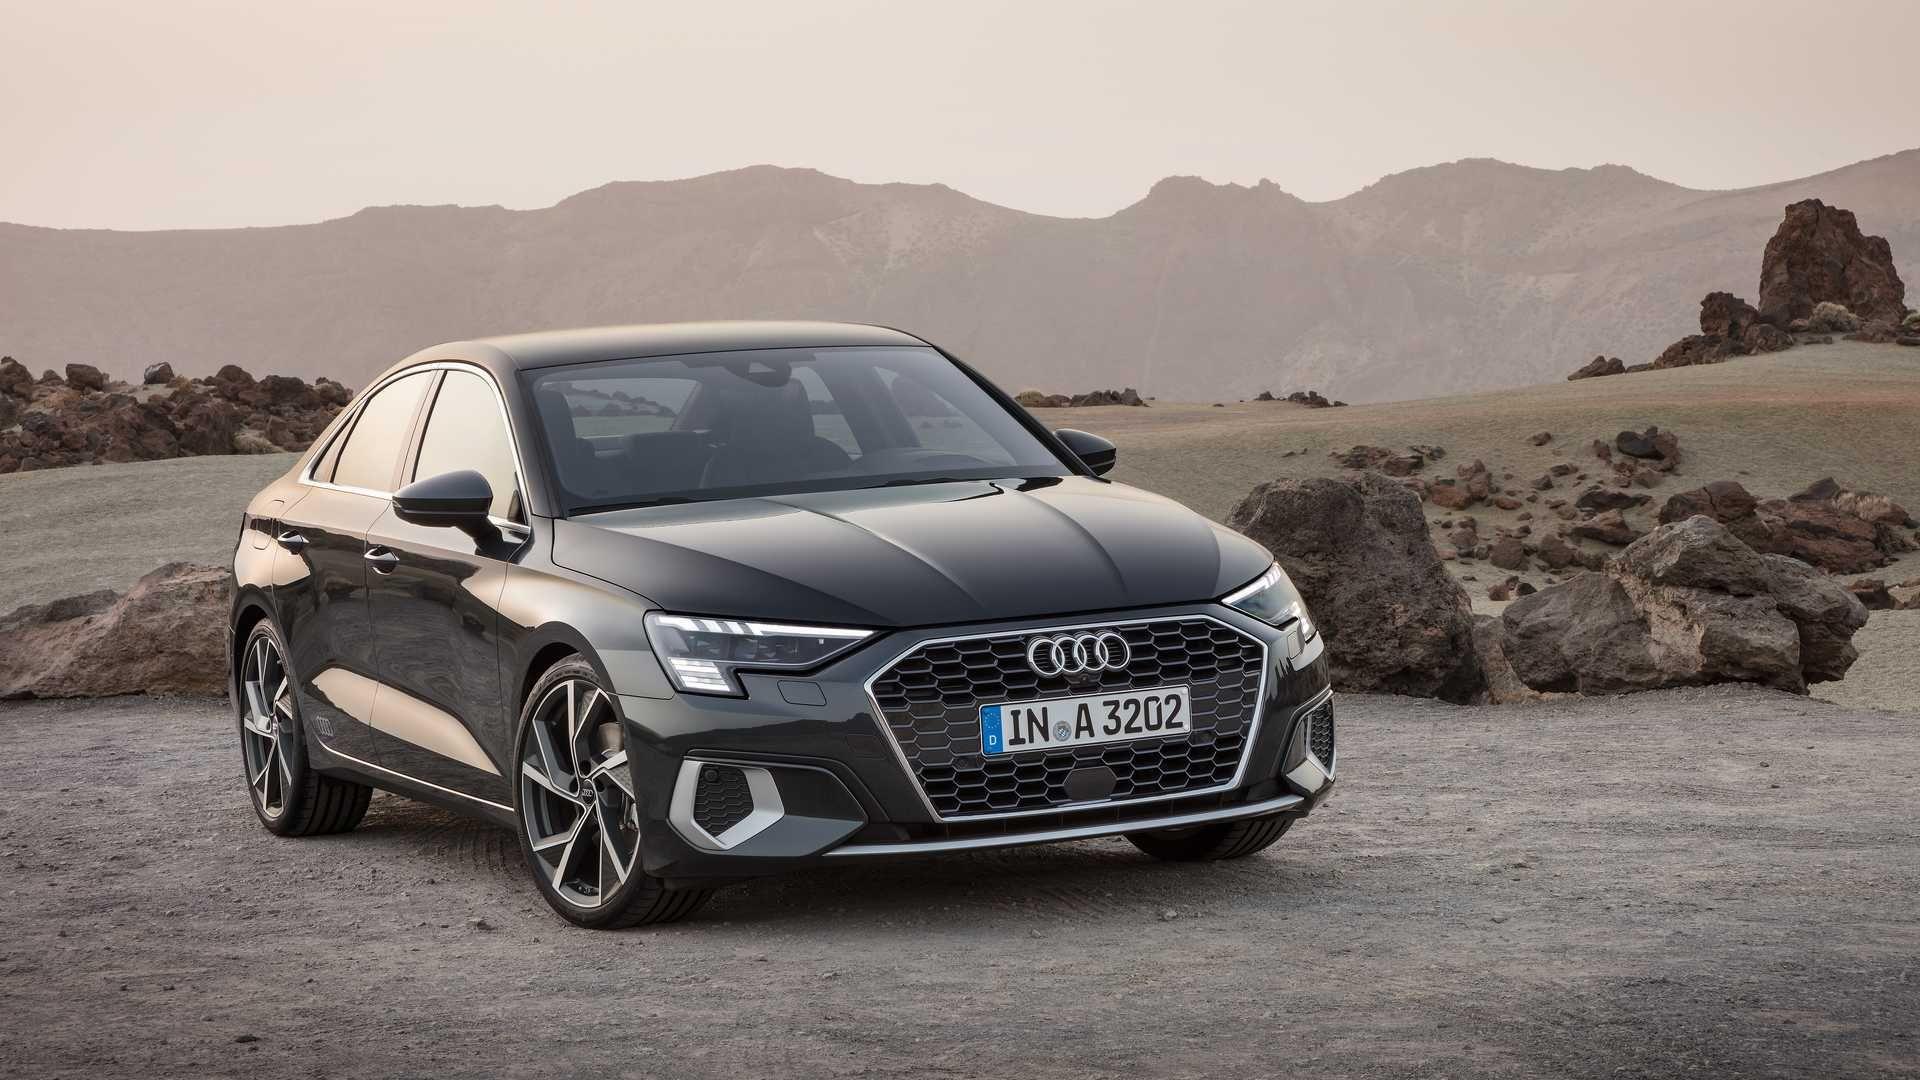 2021 Audi A3 Sedan Debuts With New Design India Launch Next Year In 2020 Audi A3 Sedan Audi Audi A3